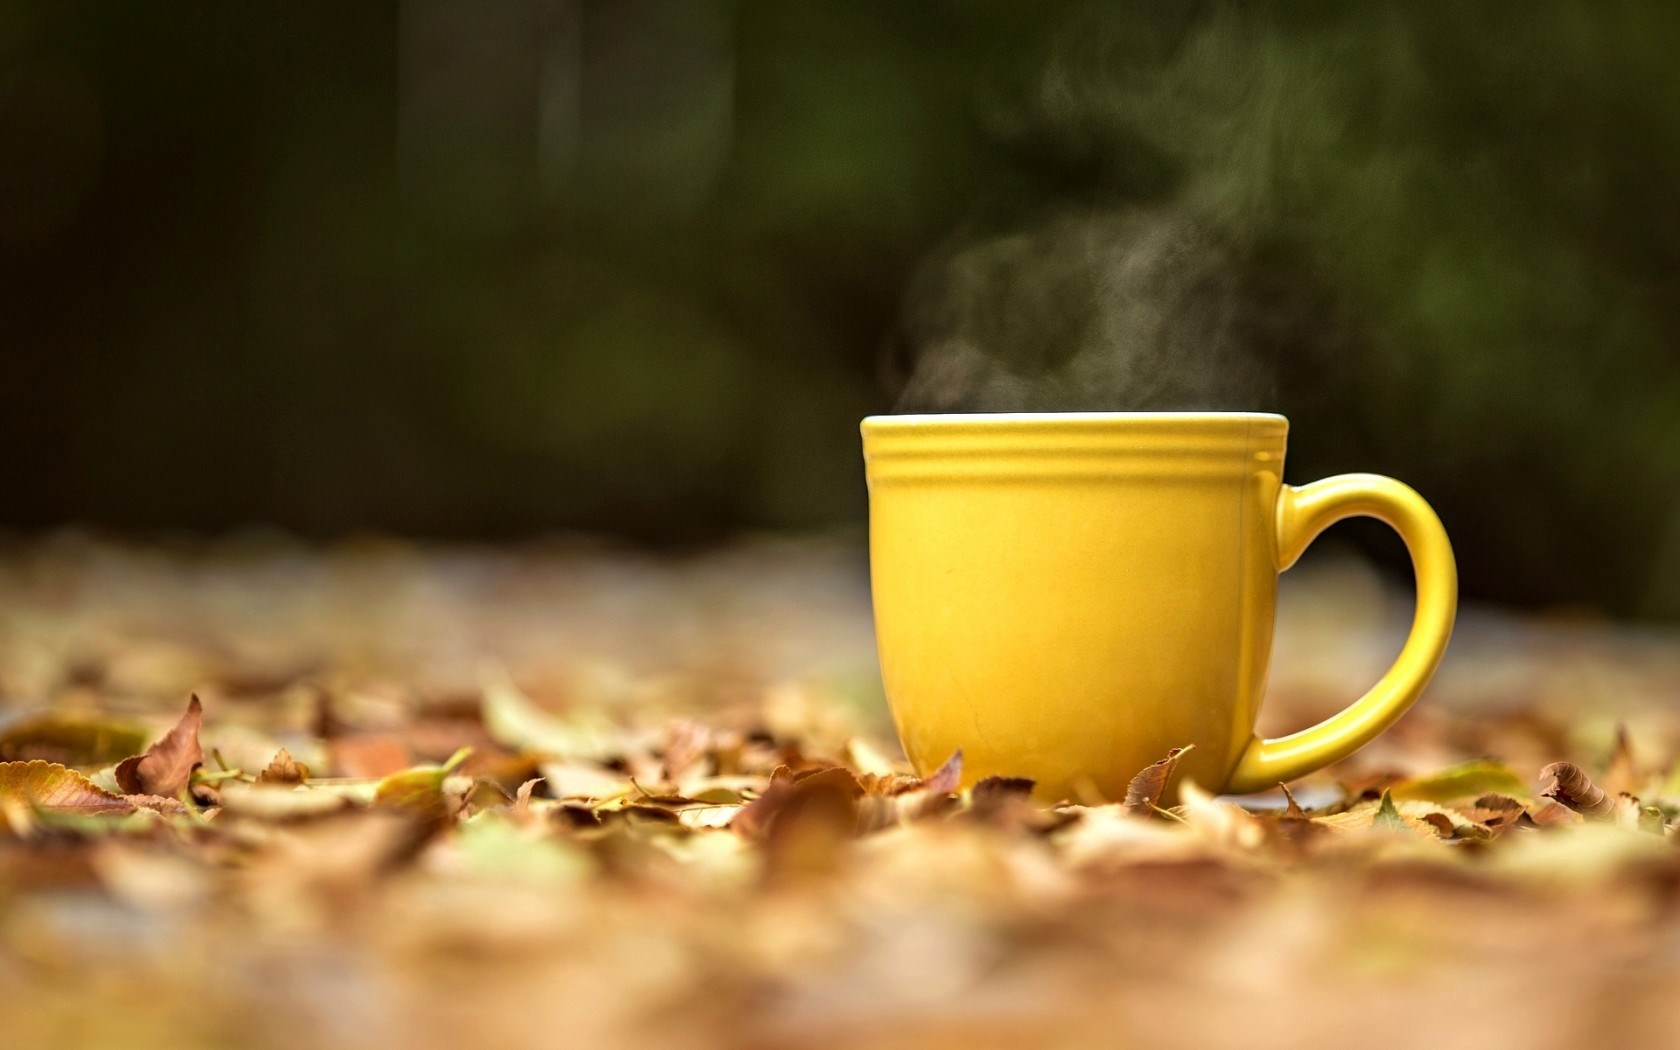 Mood Mug Cup Yellow Hot Tea Leaves Yellow Autumn HD Wallpaper